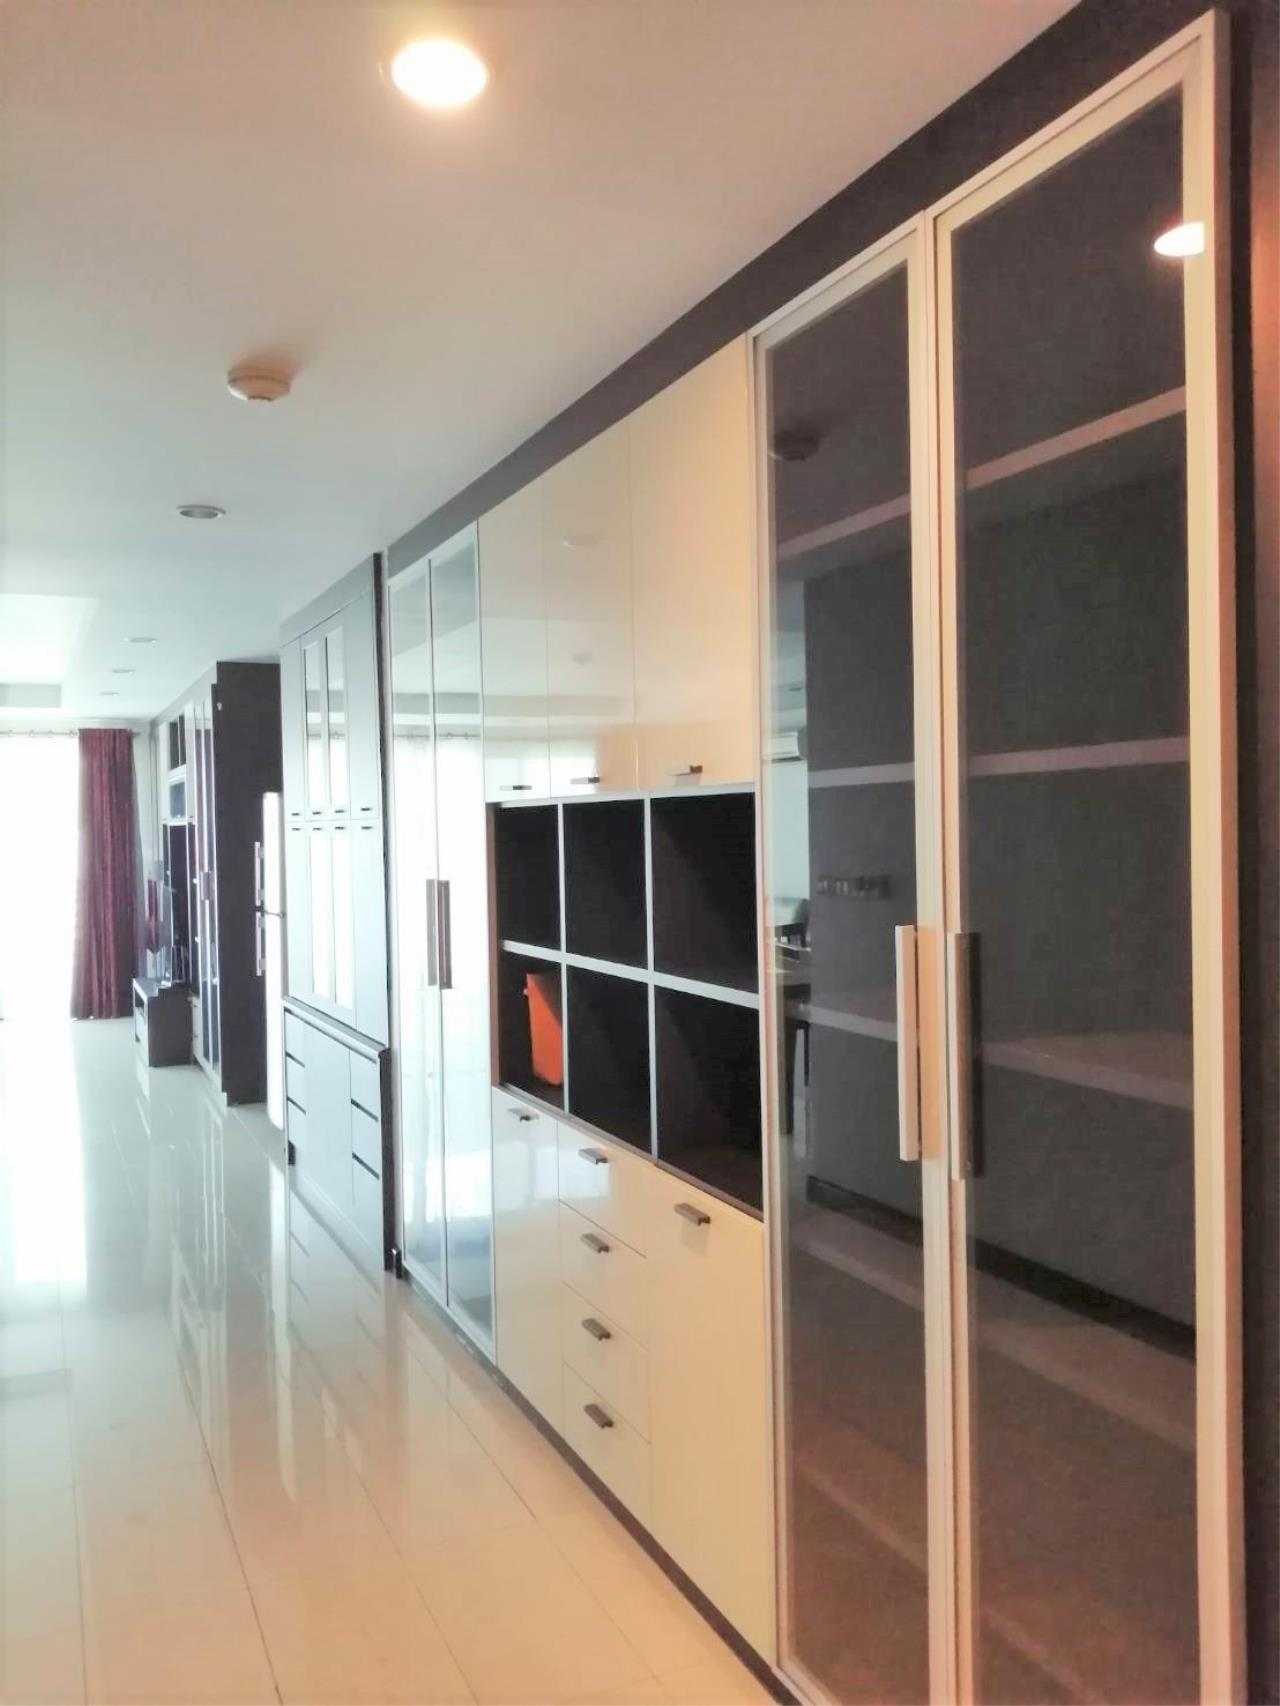 Blueocean property Agency's Condo For Rent – Avenue 61 Condominium 3